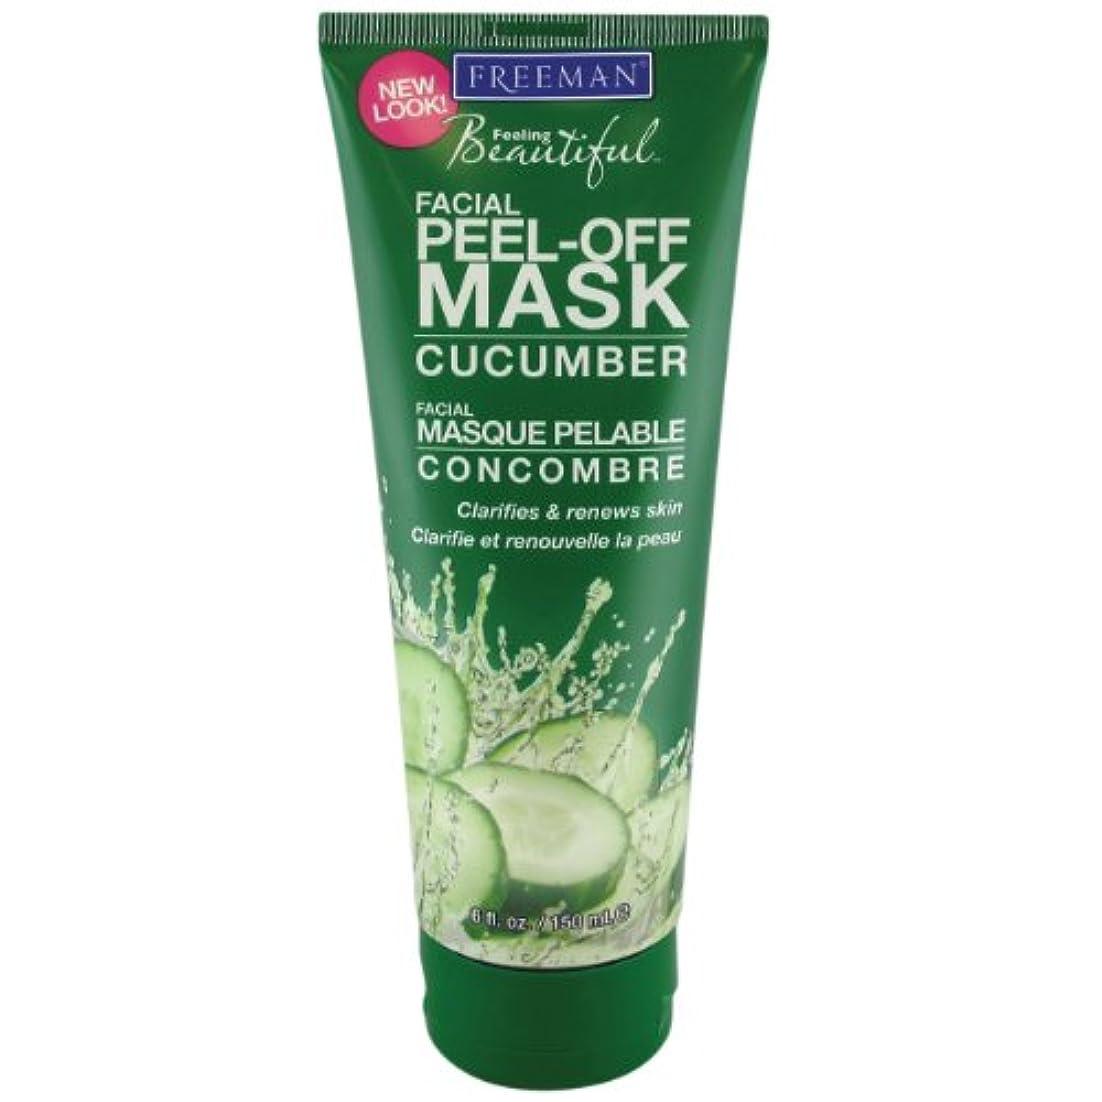 Freeman Facial Peel-Off Mask Cucumber 150 ml (並行輸入品)